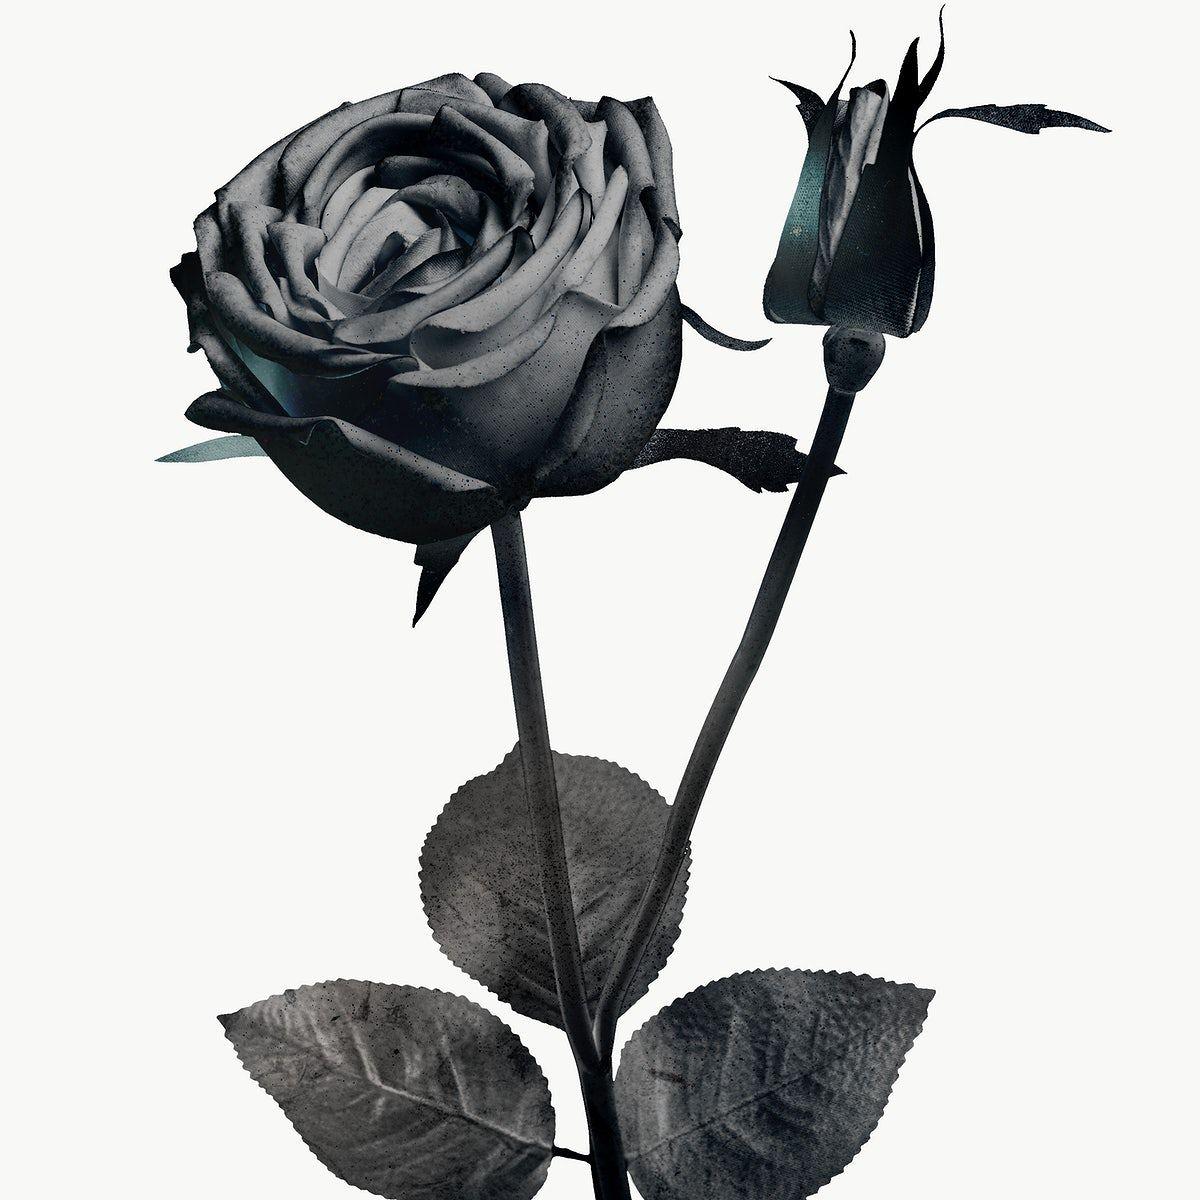 Monotone Blooming Rose Design Element Free Image By Rawpixel Com Adj In 2020 Rose Illustration Blooming Rose Rose Art